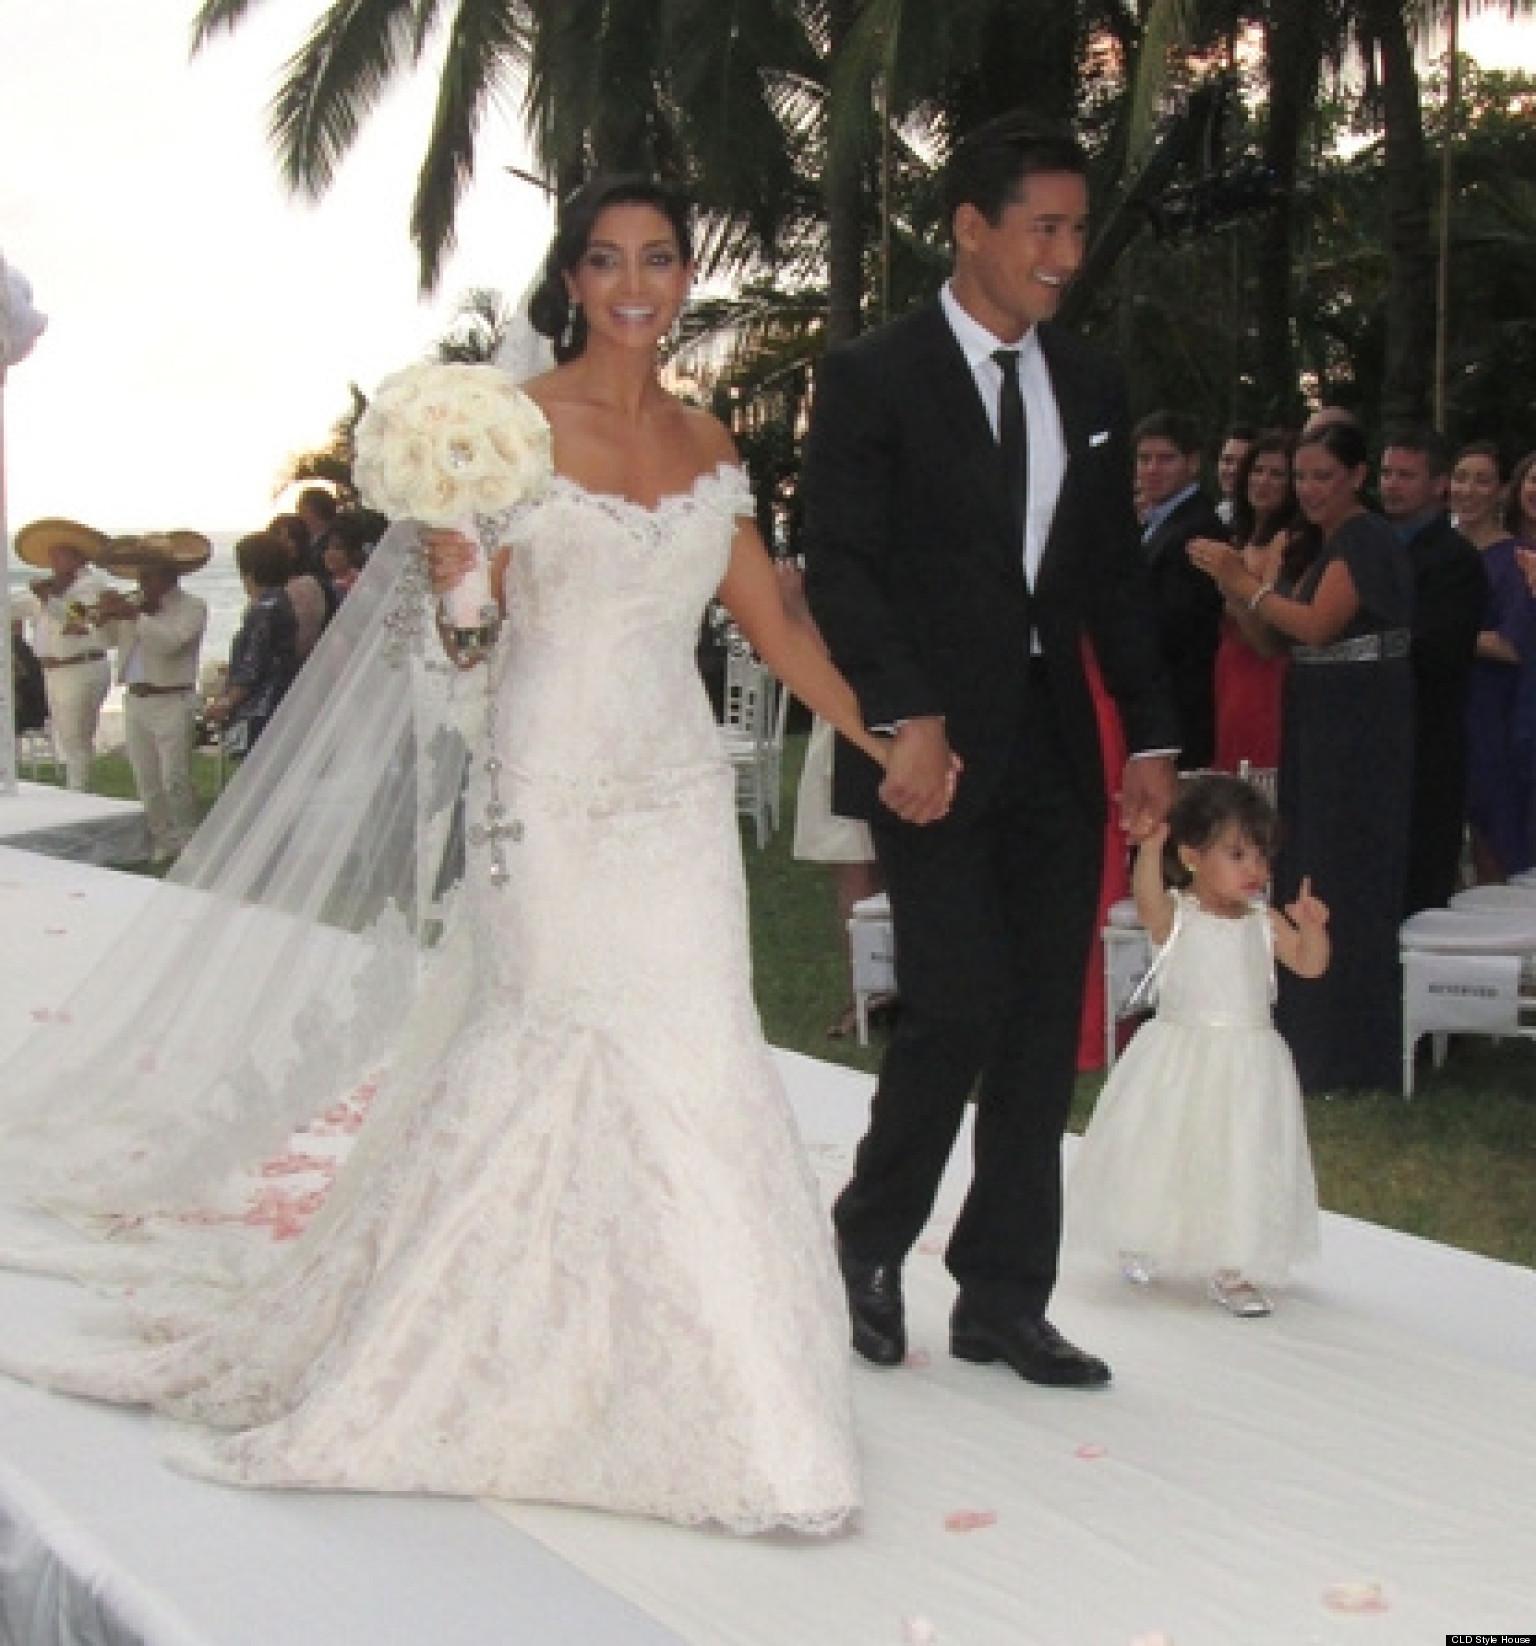 Bridal Photo Gallery: Mario Lopez Wedding: Photos From The 'Extra' Host's